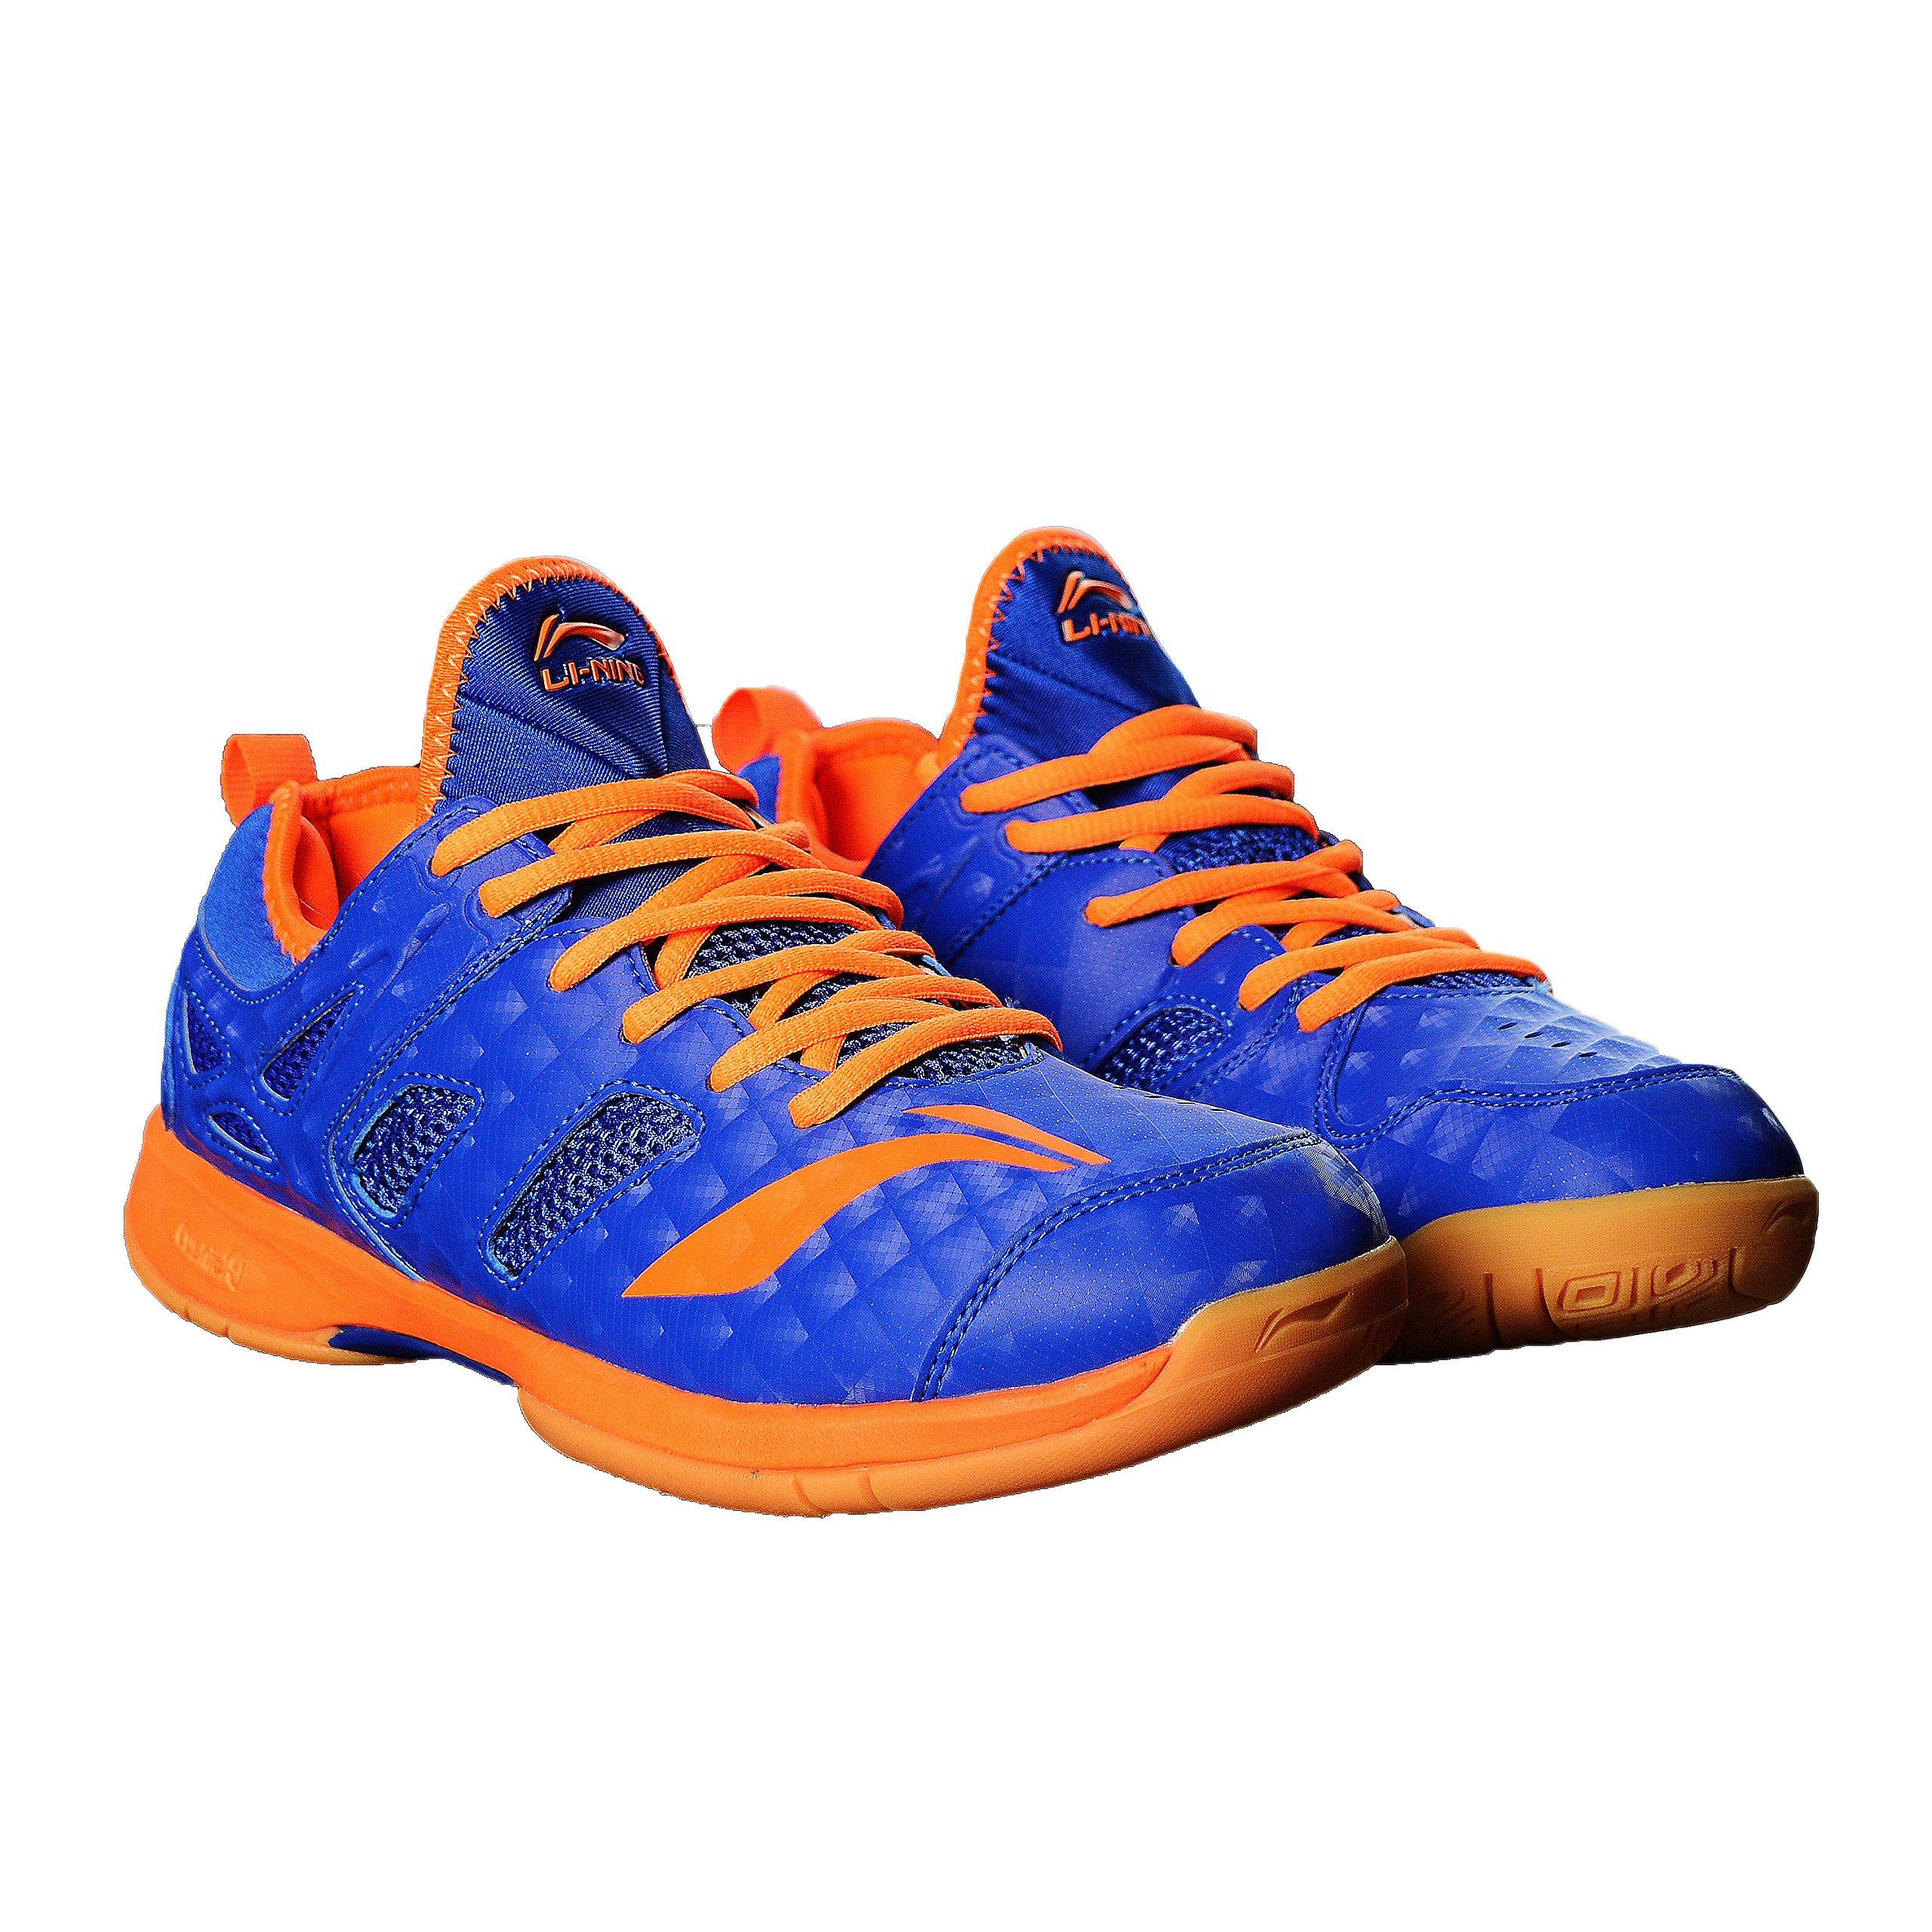 Li-Ning Brio ll Badminton Shoe product image